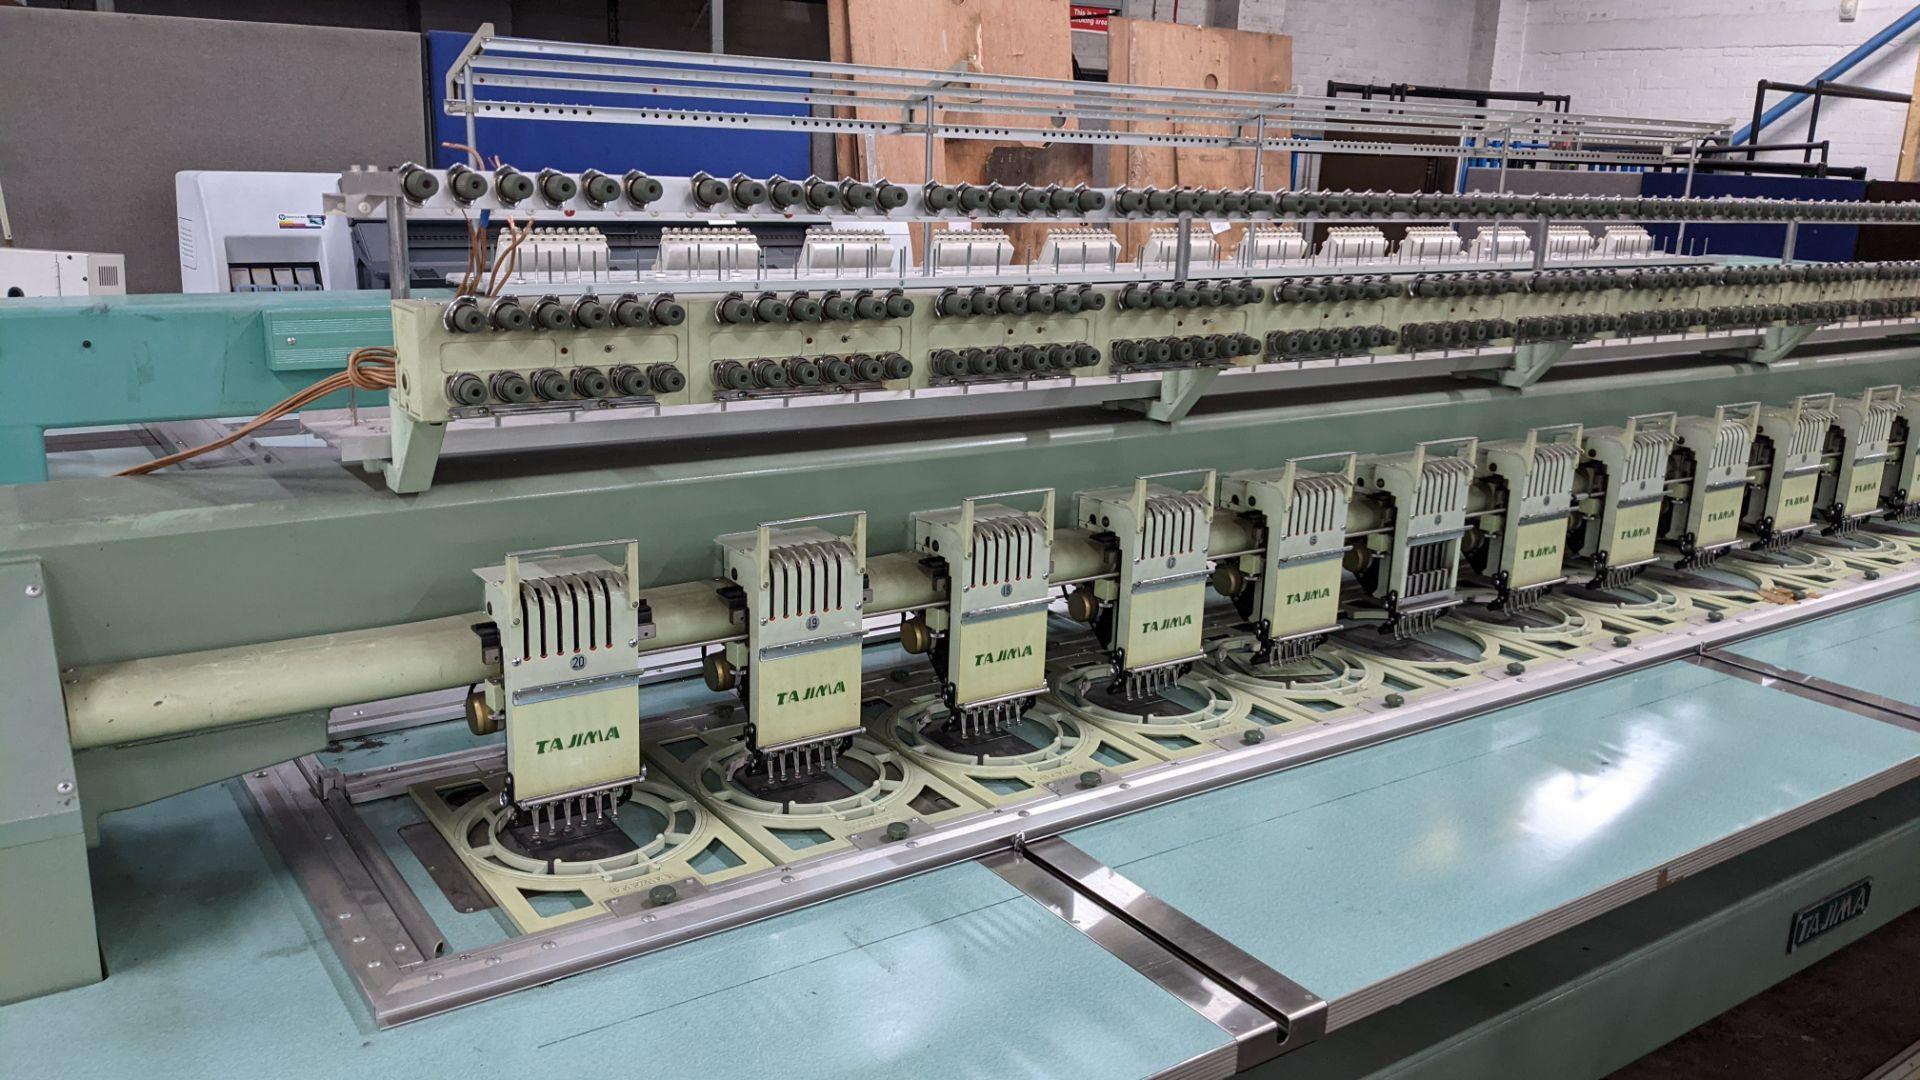 Tokai Tajima electronic 20 head automatic embroidery machine model TMEG-G620, manufacturing number 7 - Image 9 of 19